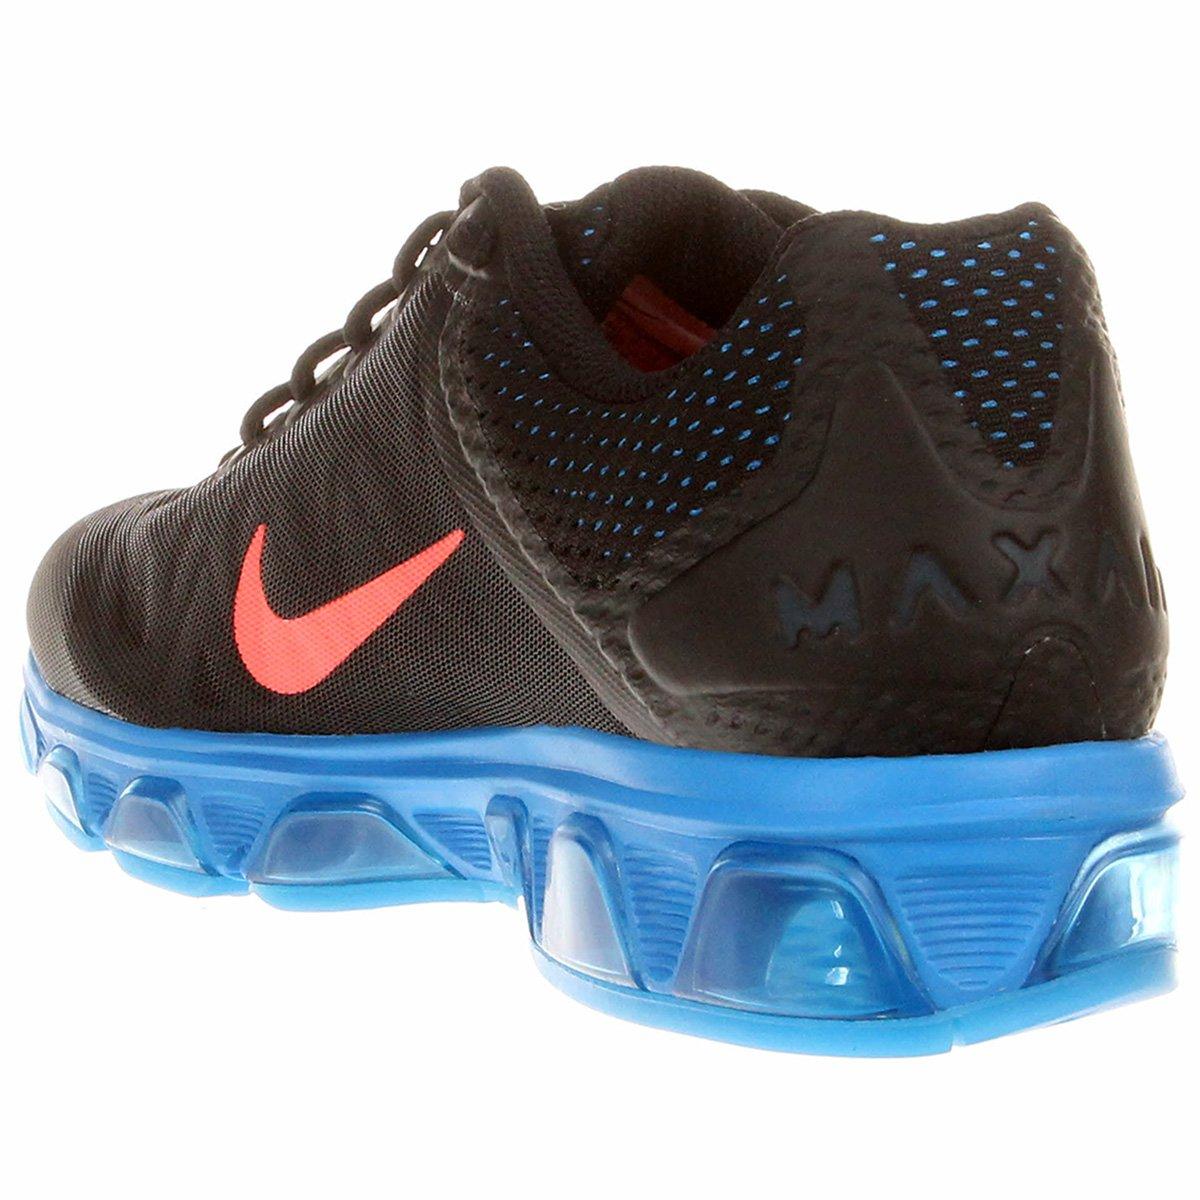 Tênis Nike Air Max Tailwind 7 - Compre Agora  423fca2e64b37